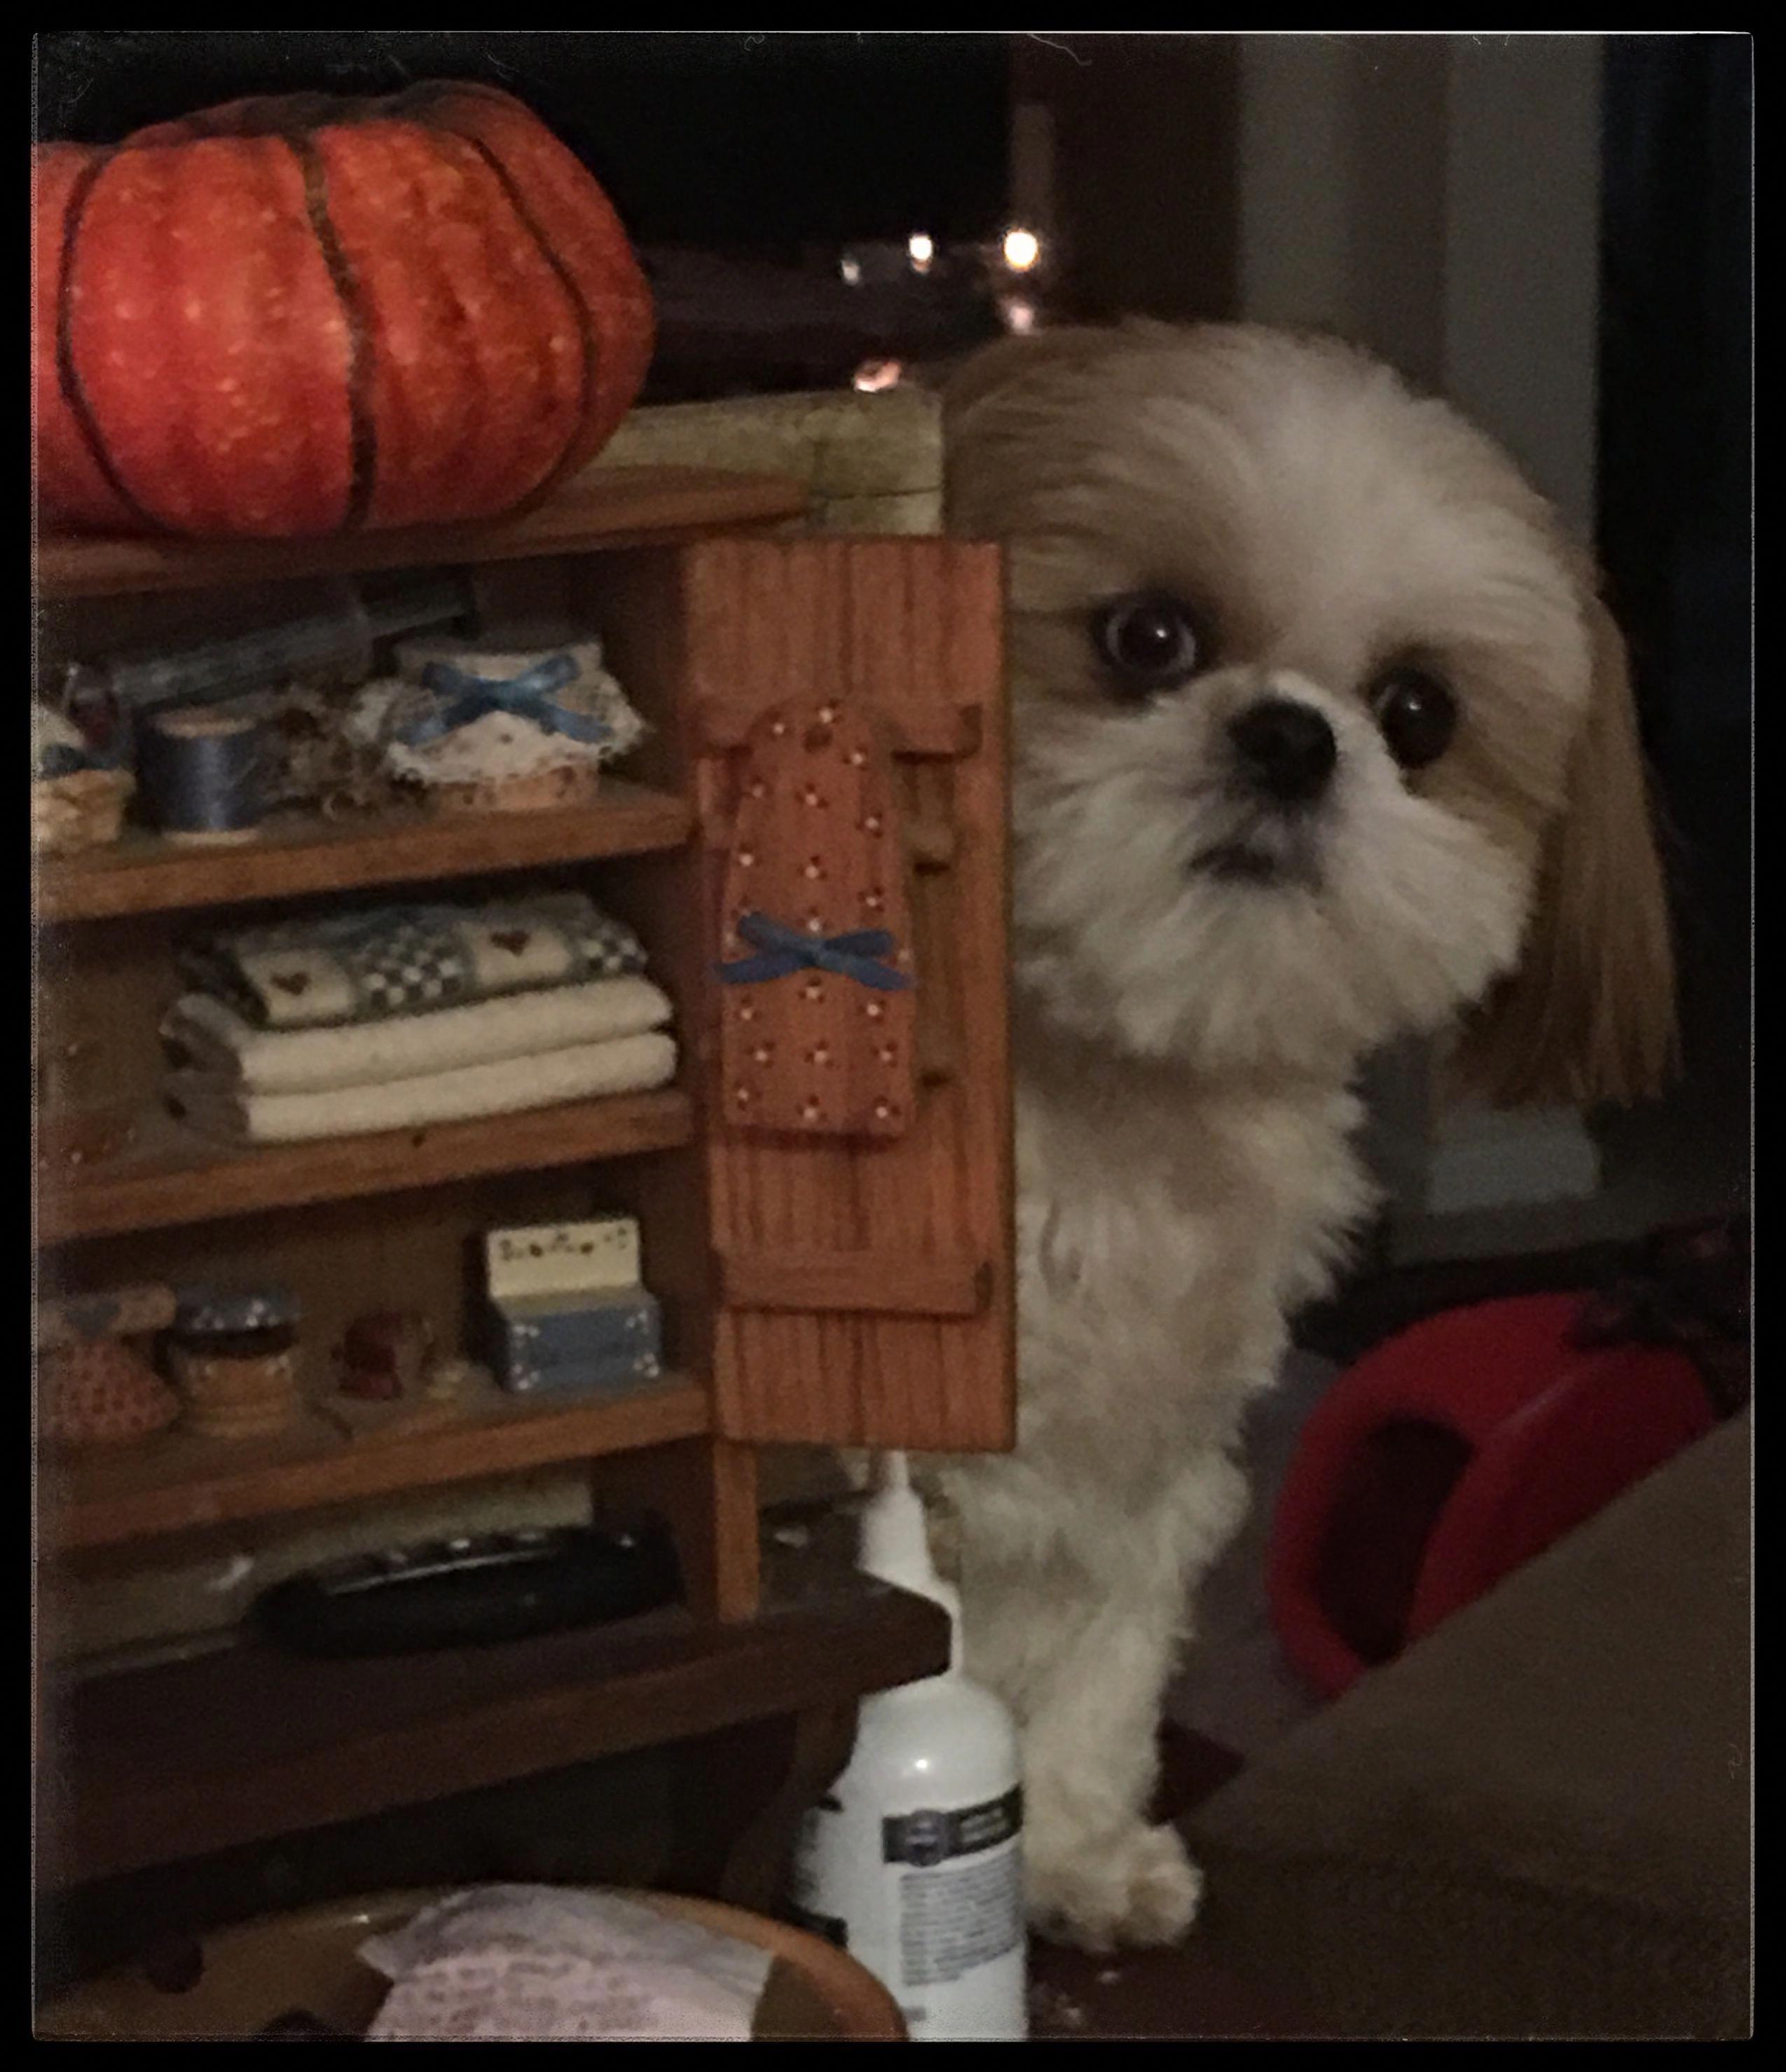 Shih Tzu Affectionate And Playful Shih Tzu Puppy Shih Tzu Shih Tzu Dog